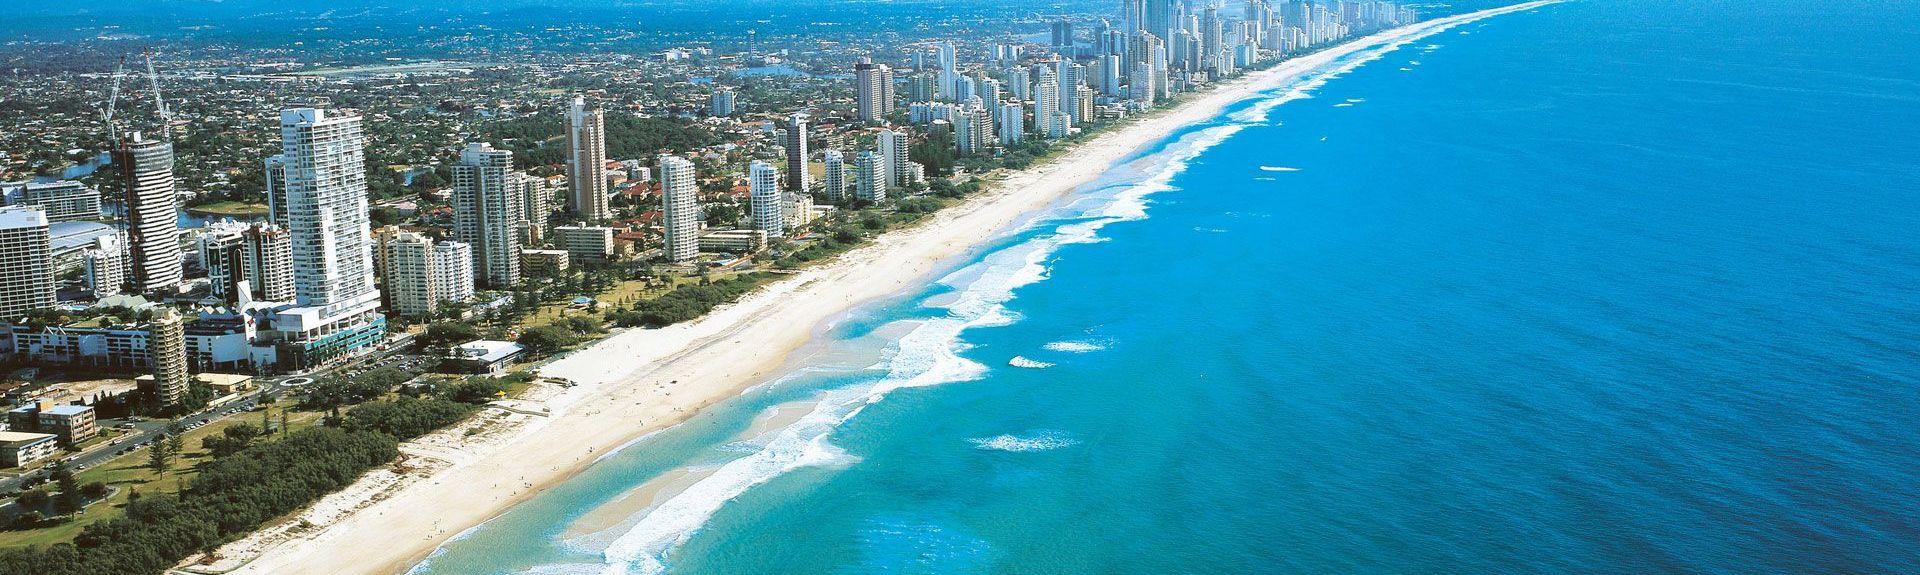 Bundall, Gold Coast, Queensland, Austrália